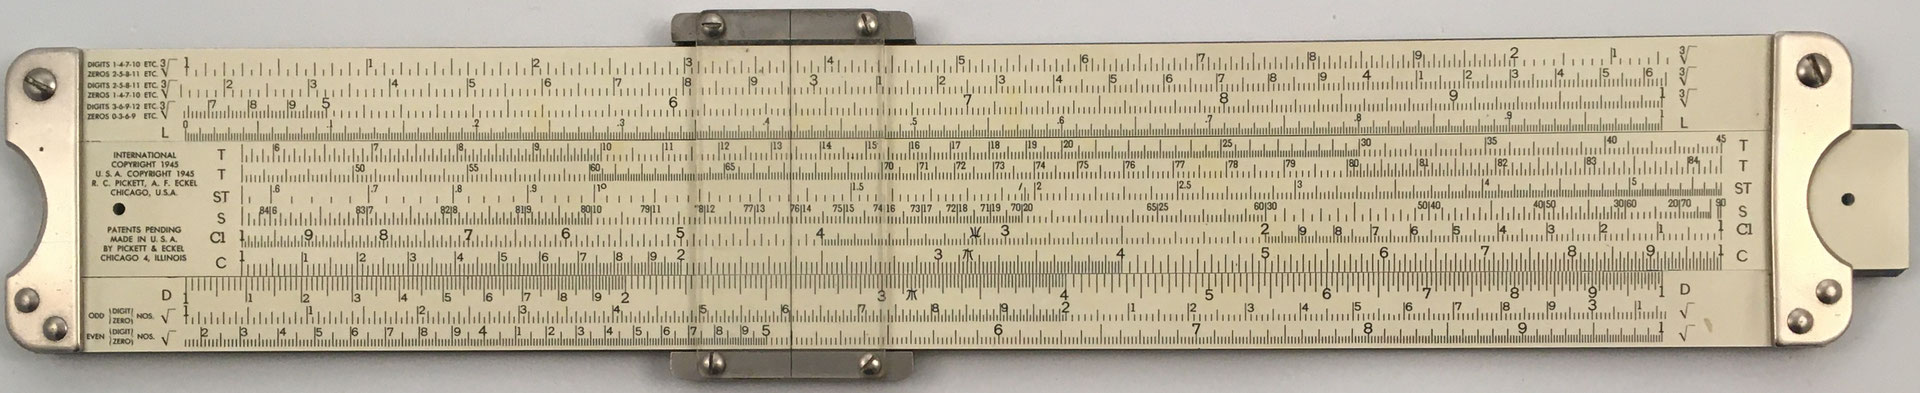 PICKETT modelo 1 (Deci Point), s/n 6381, primera regla fabricada por R.C. Pickett & A.F. Eckel en Chicago (USA) año 1945, 30.7x5,2 cm